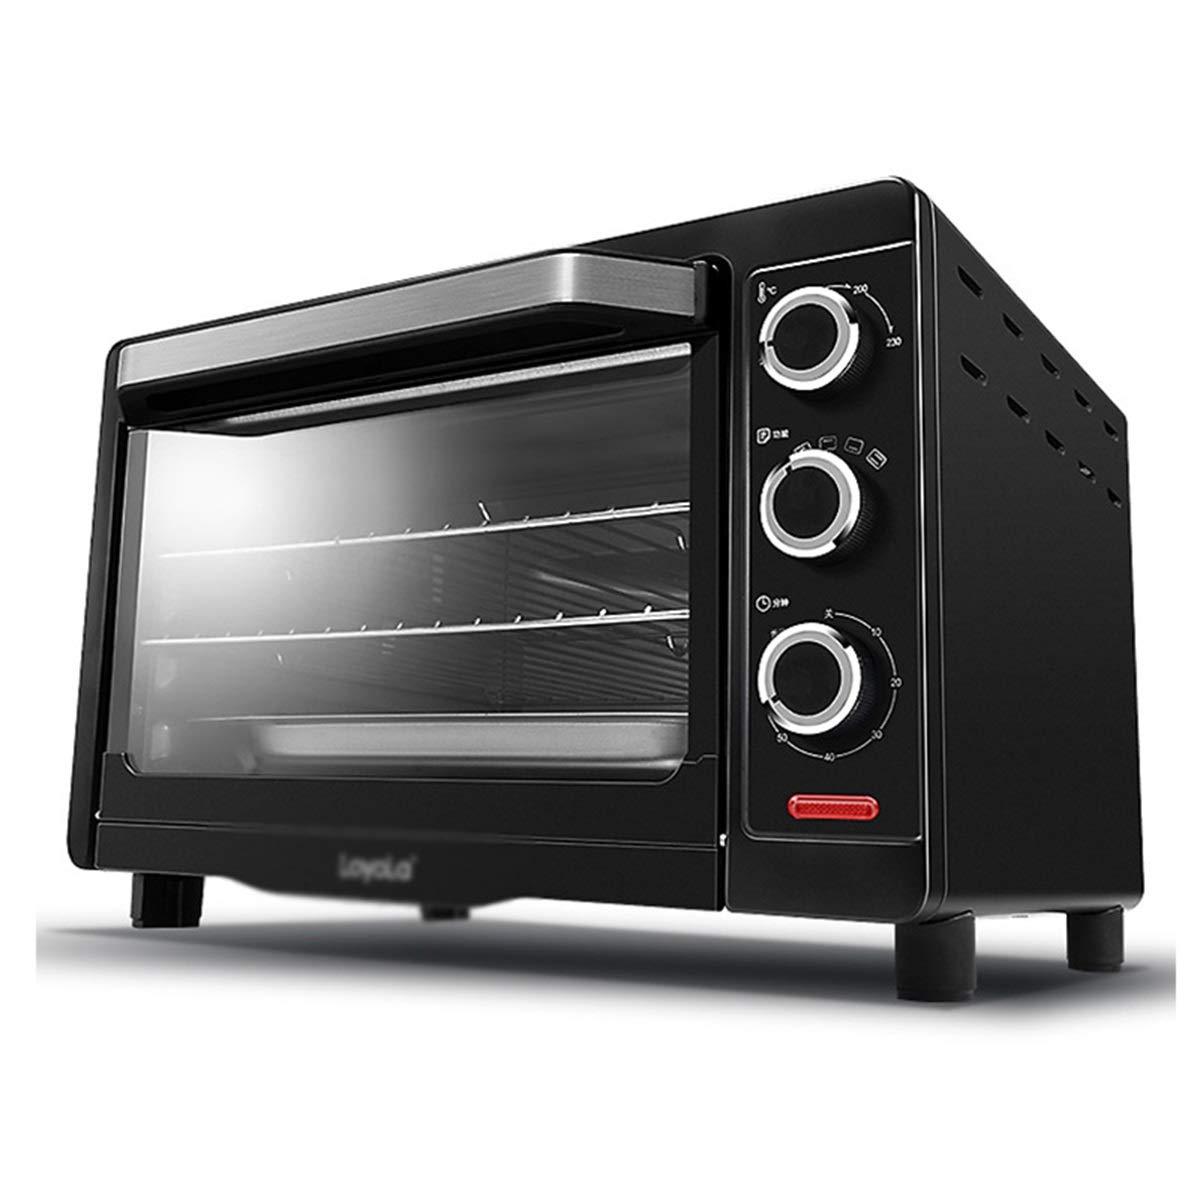 PANGU-ZC 小型オーブン PANGU-ZC - 小型オーブン 小型オーブン26Lオーブンの電気オーブンとの多機能オーブンの世帯のベーキングオーブンのケーキの大きい容量 B07QNFF39T -オーブン B07QNFF39T, タダオカチョウ:30396f8f --- sayselfiee.com